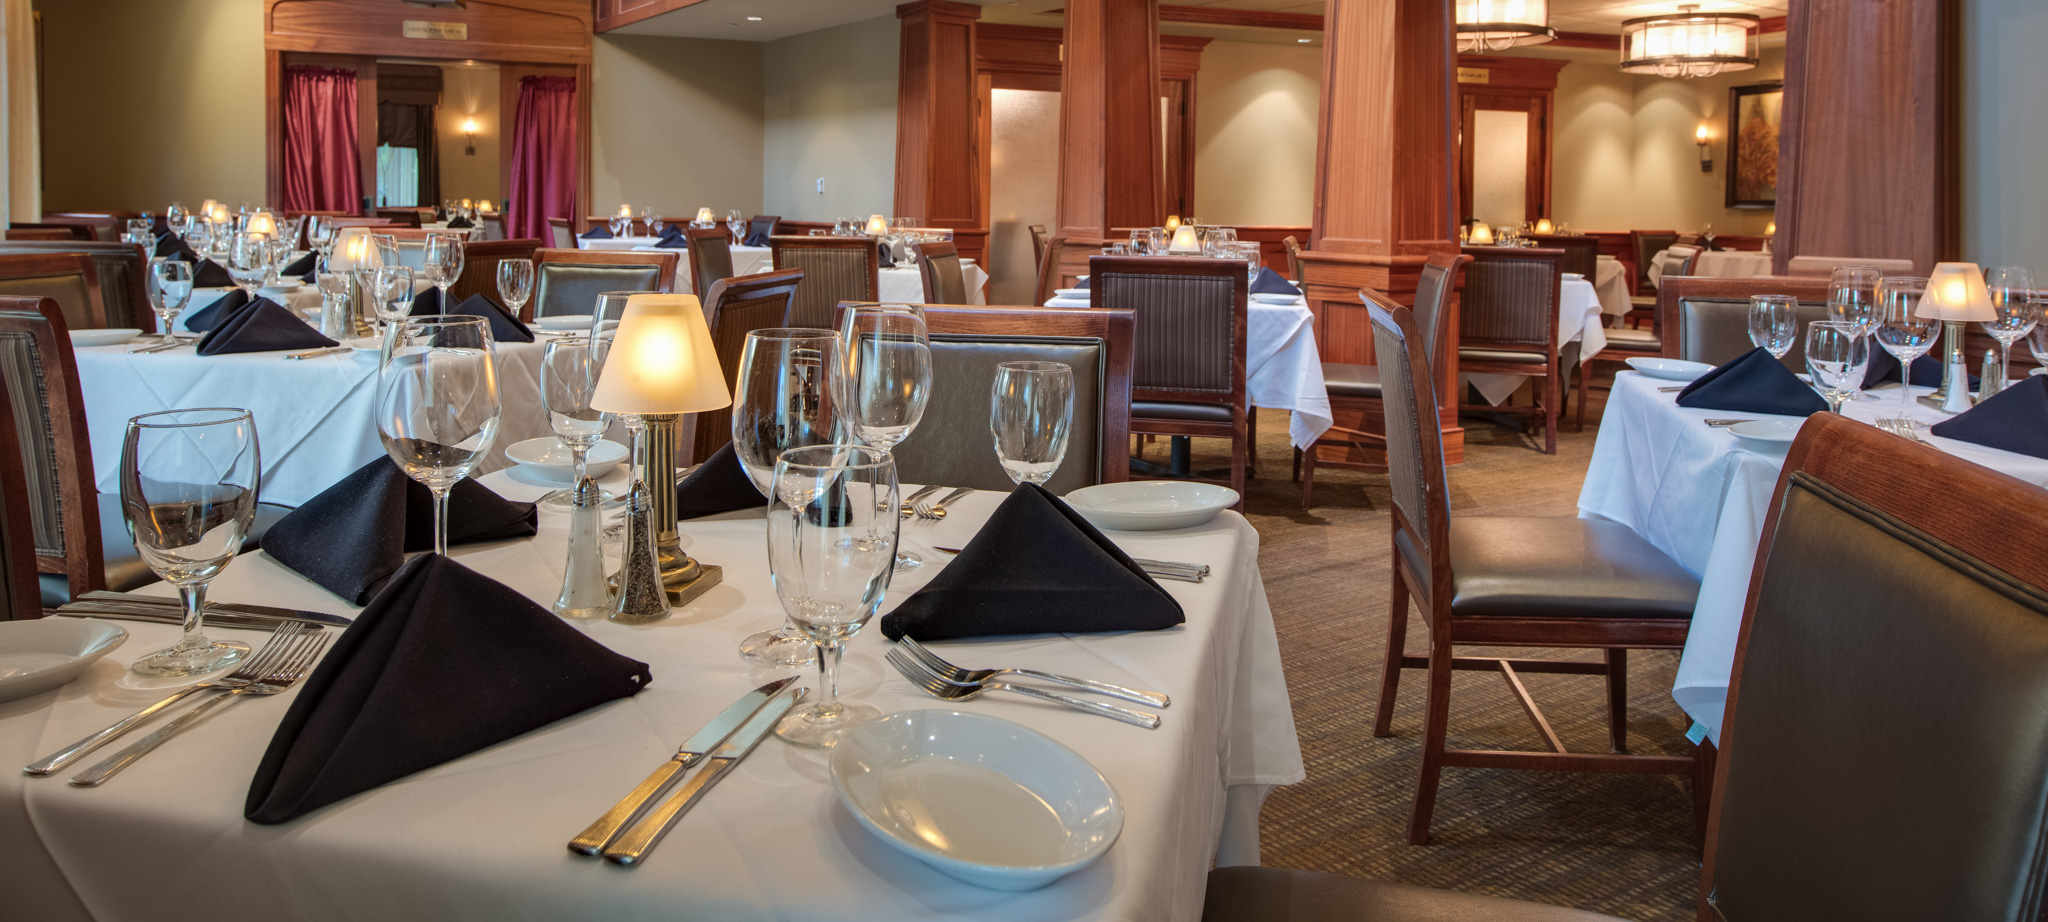 Ruth's Chris Steak House - Dining 3